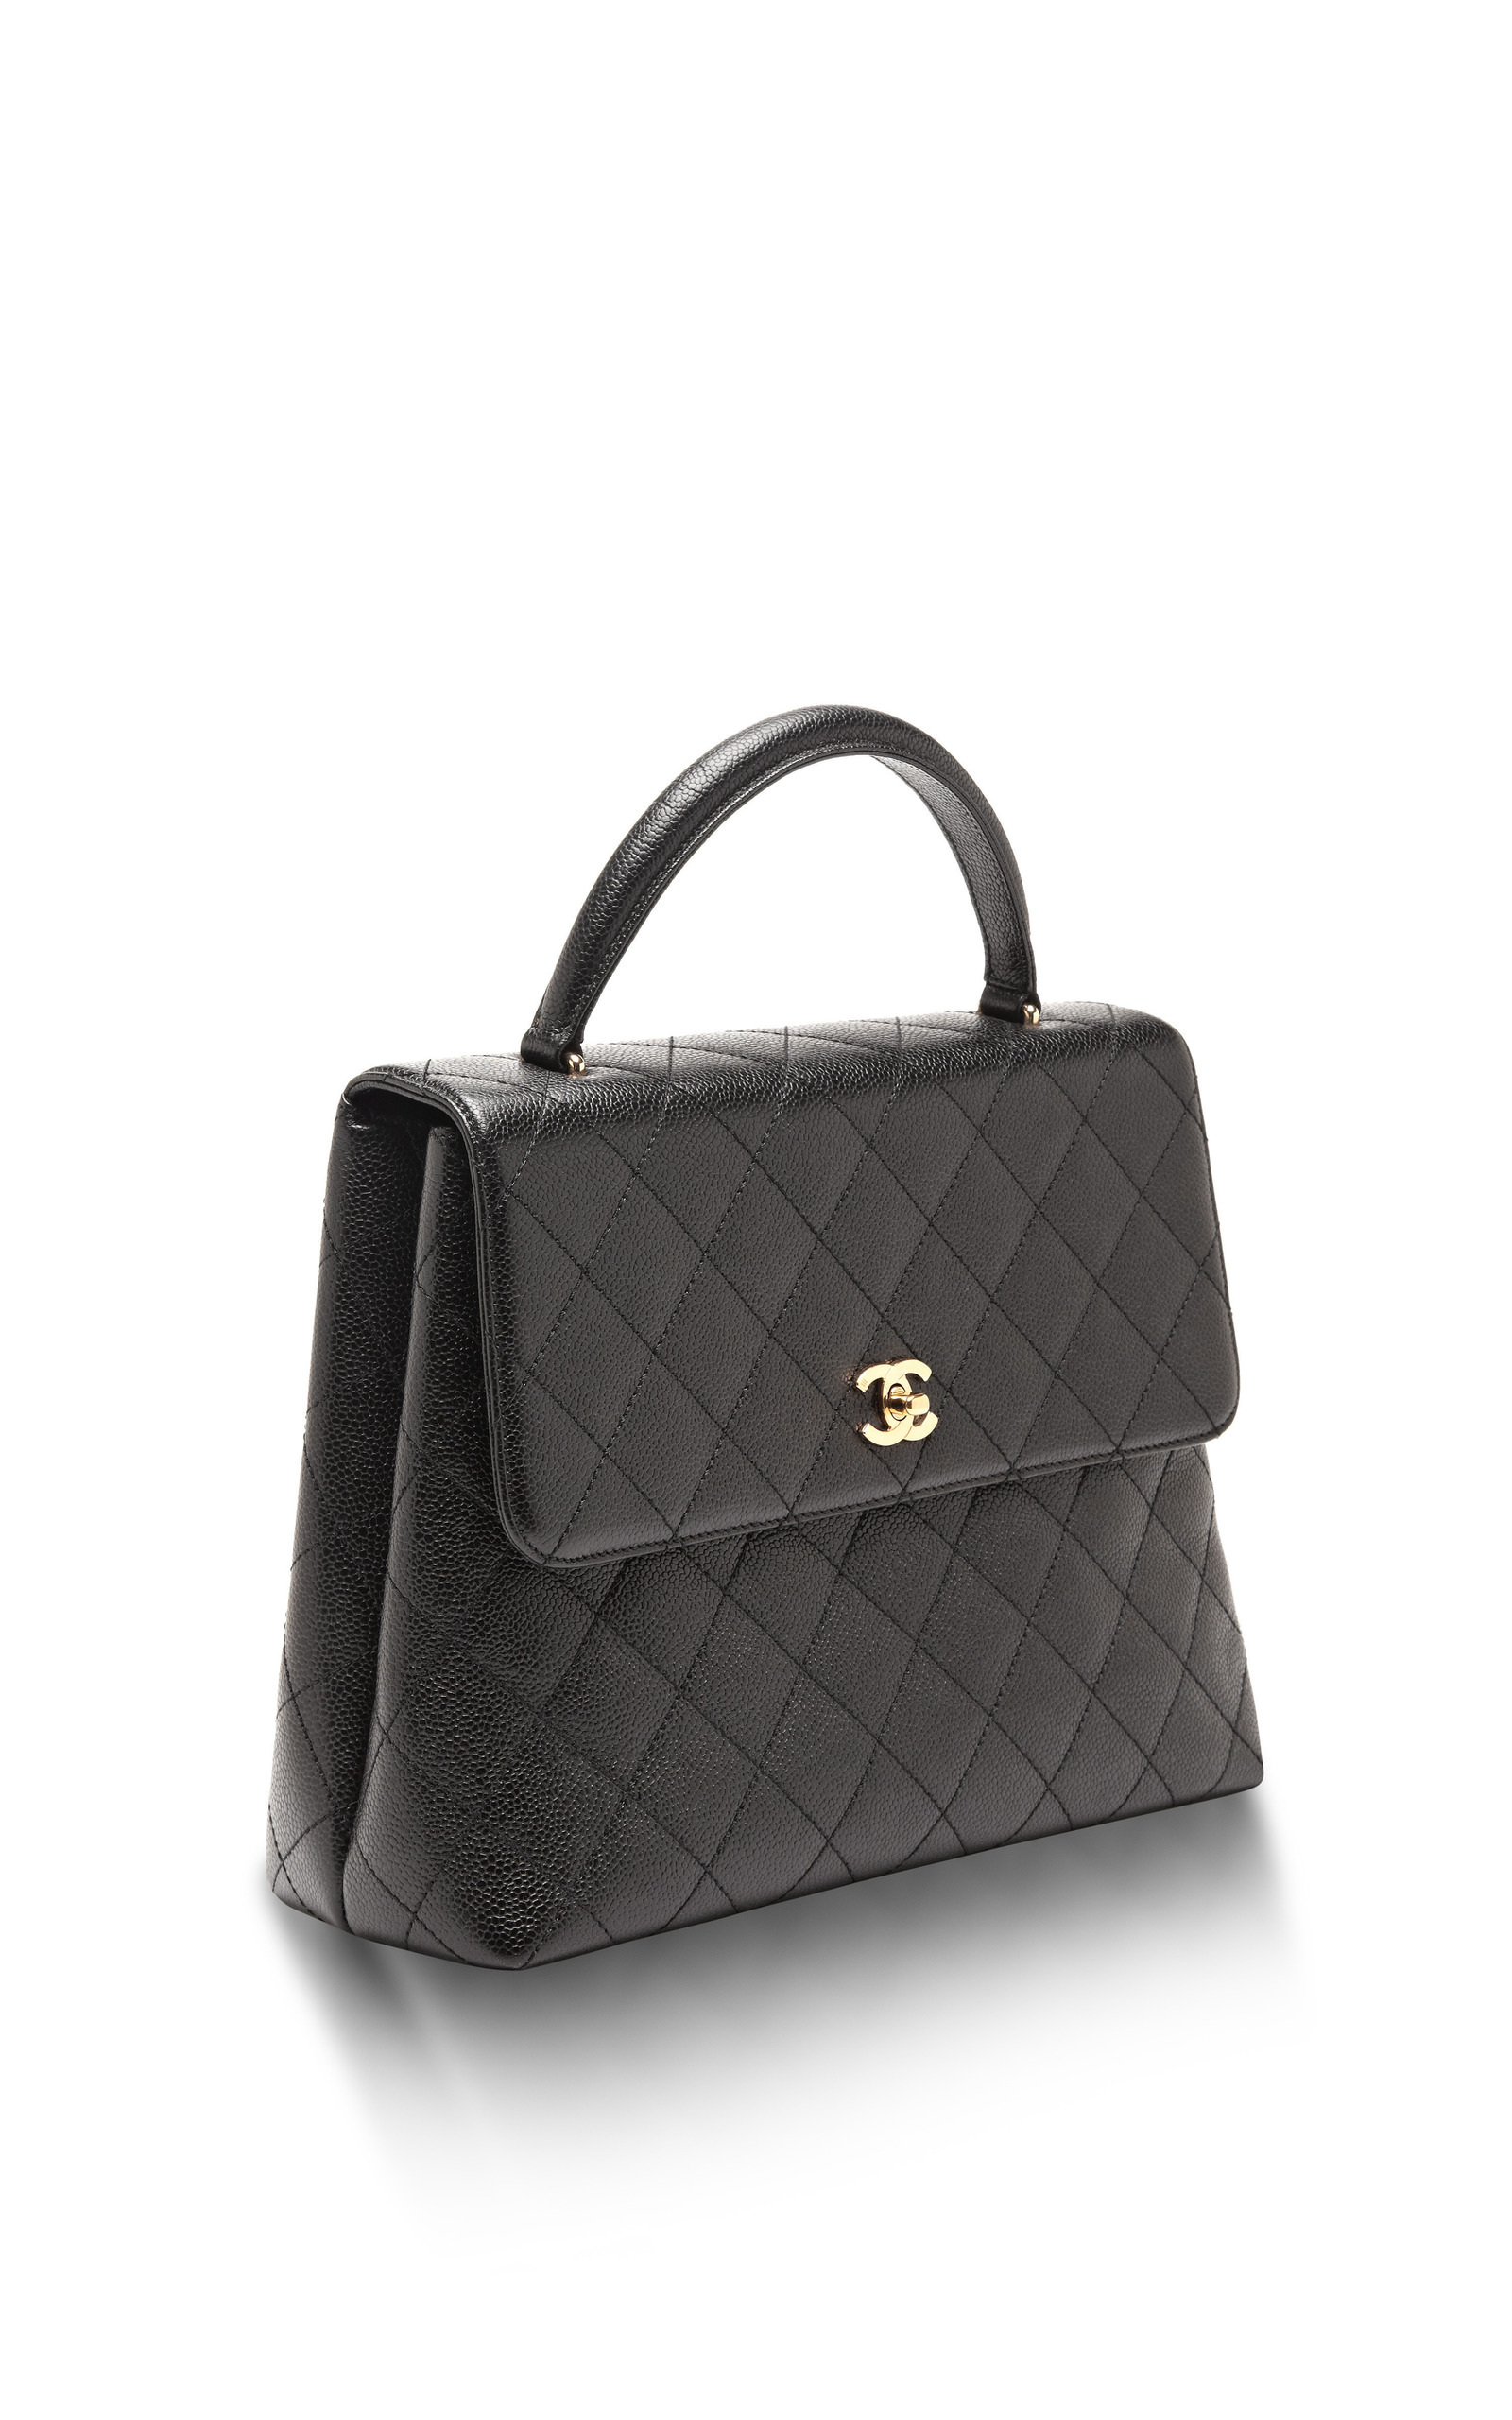 de785b815300 Collectible JacketsVintage Chanel Black Caviar Kelly Bag. CLOSE. Loading